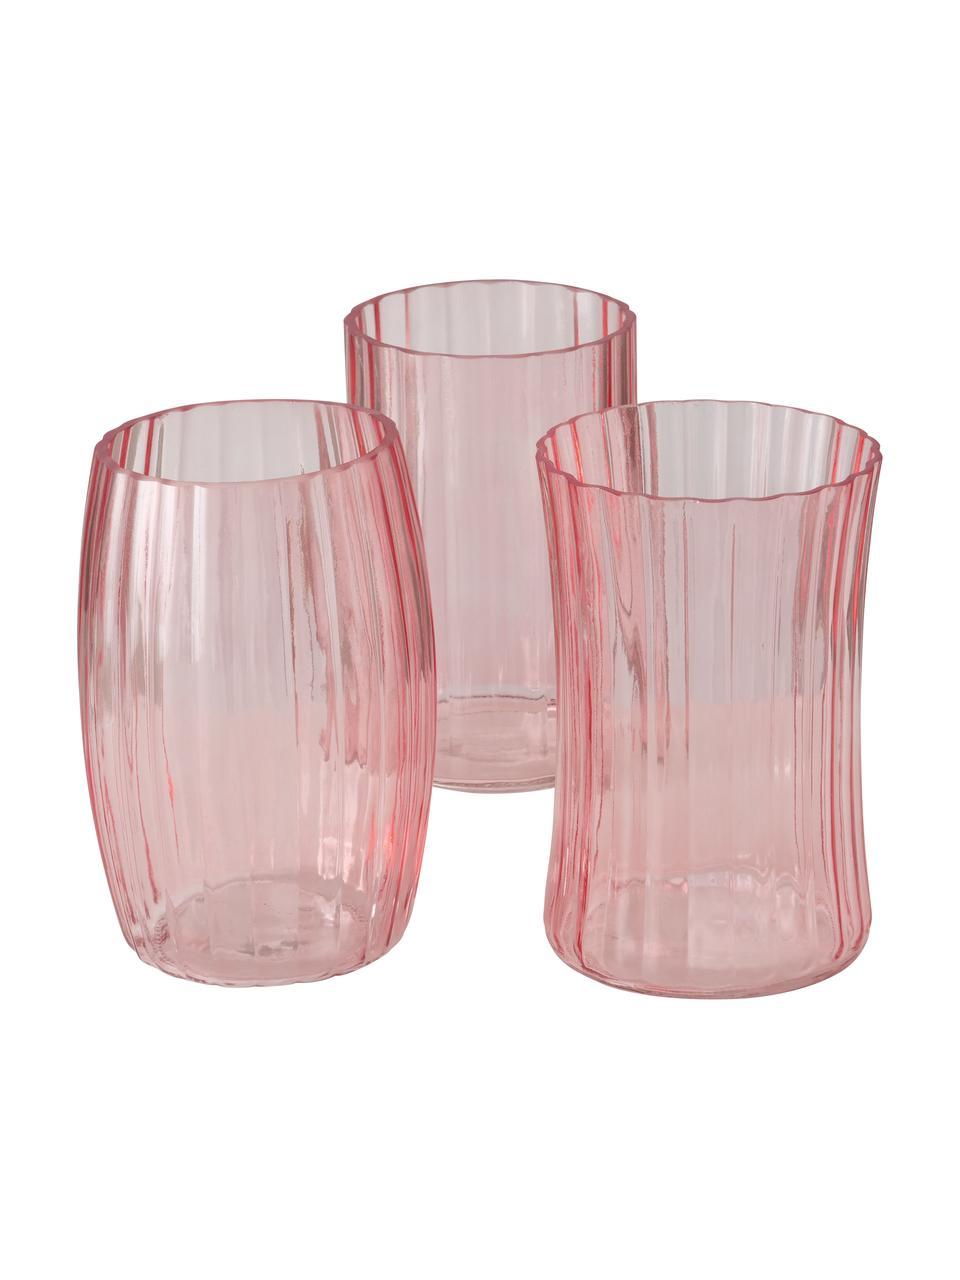 Vasen-Set Malinia, 3-tlg., Glas, Rosa, transparent, Ø 13 x H 19 cm